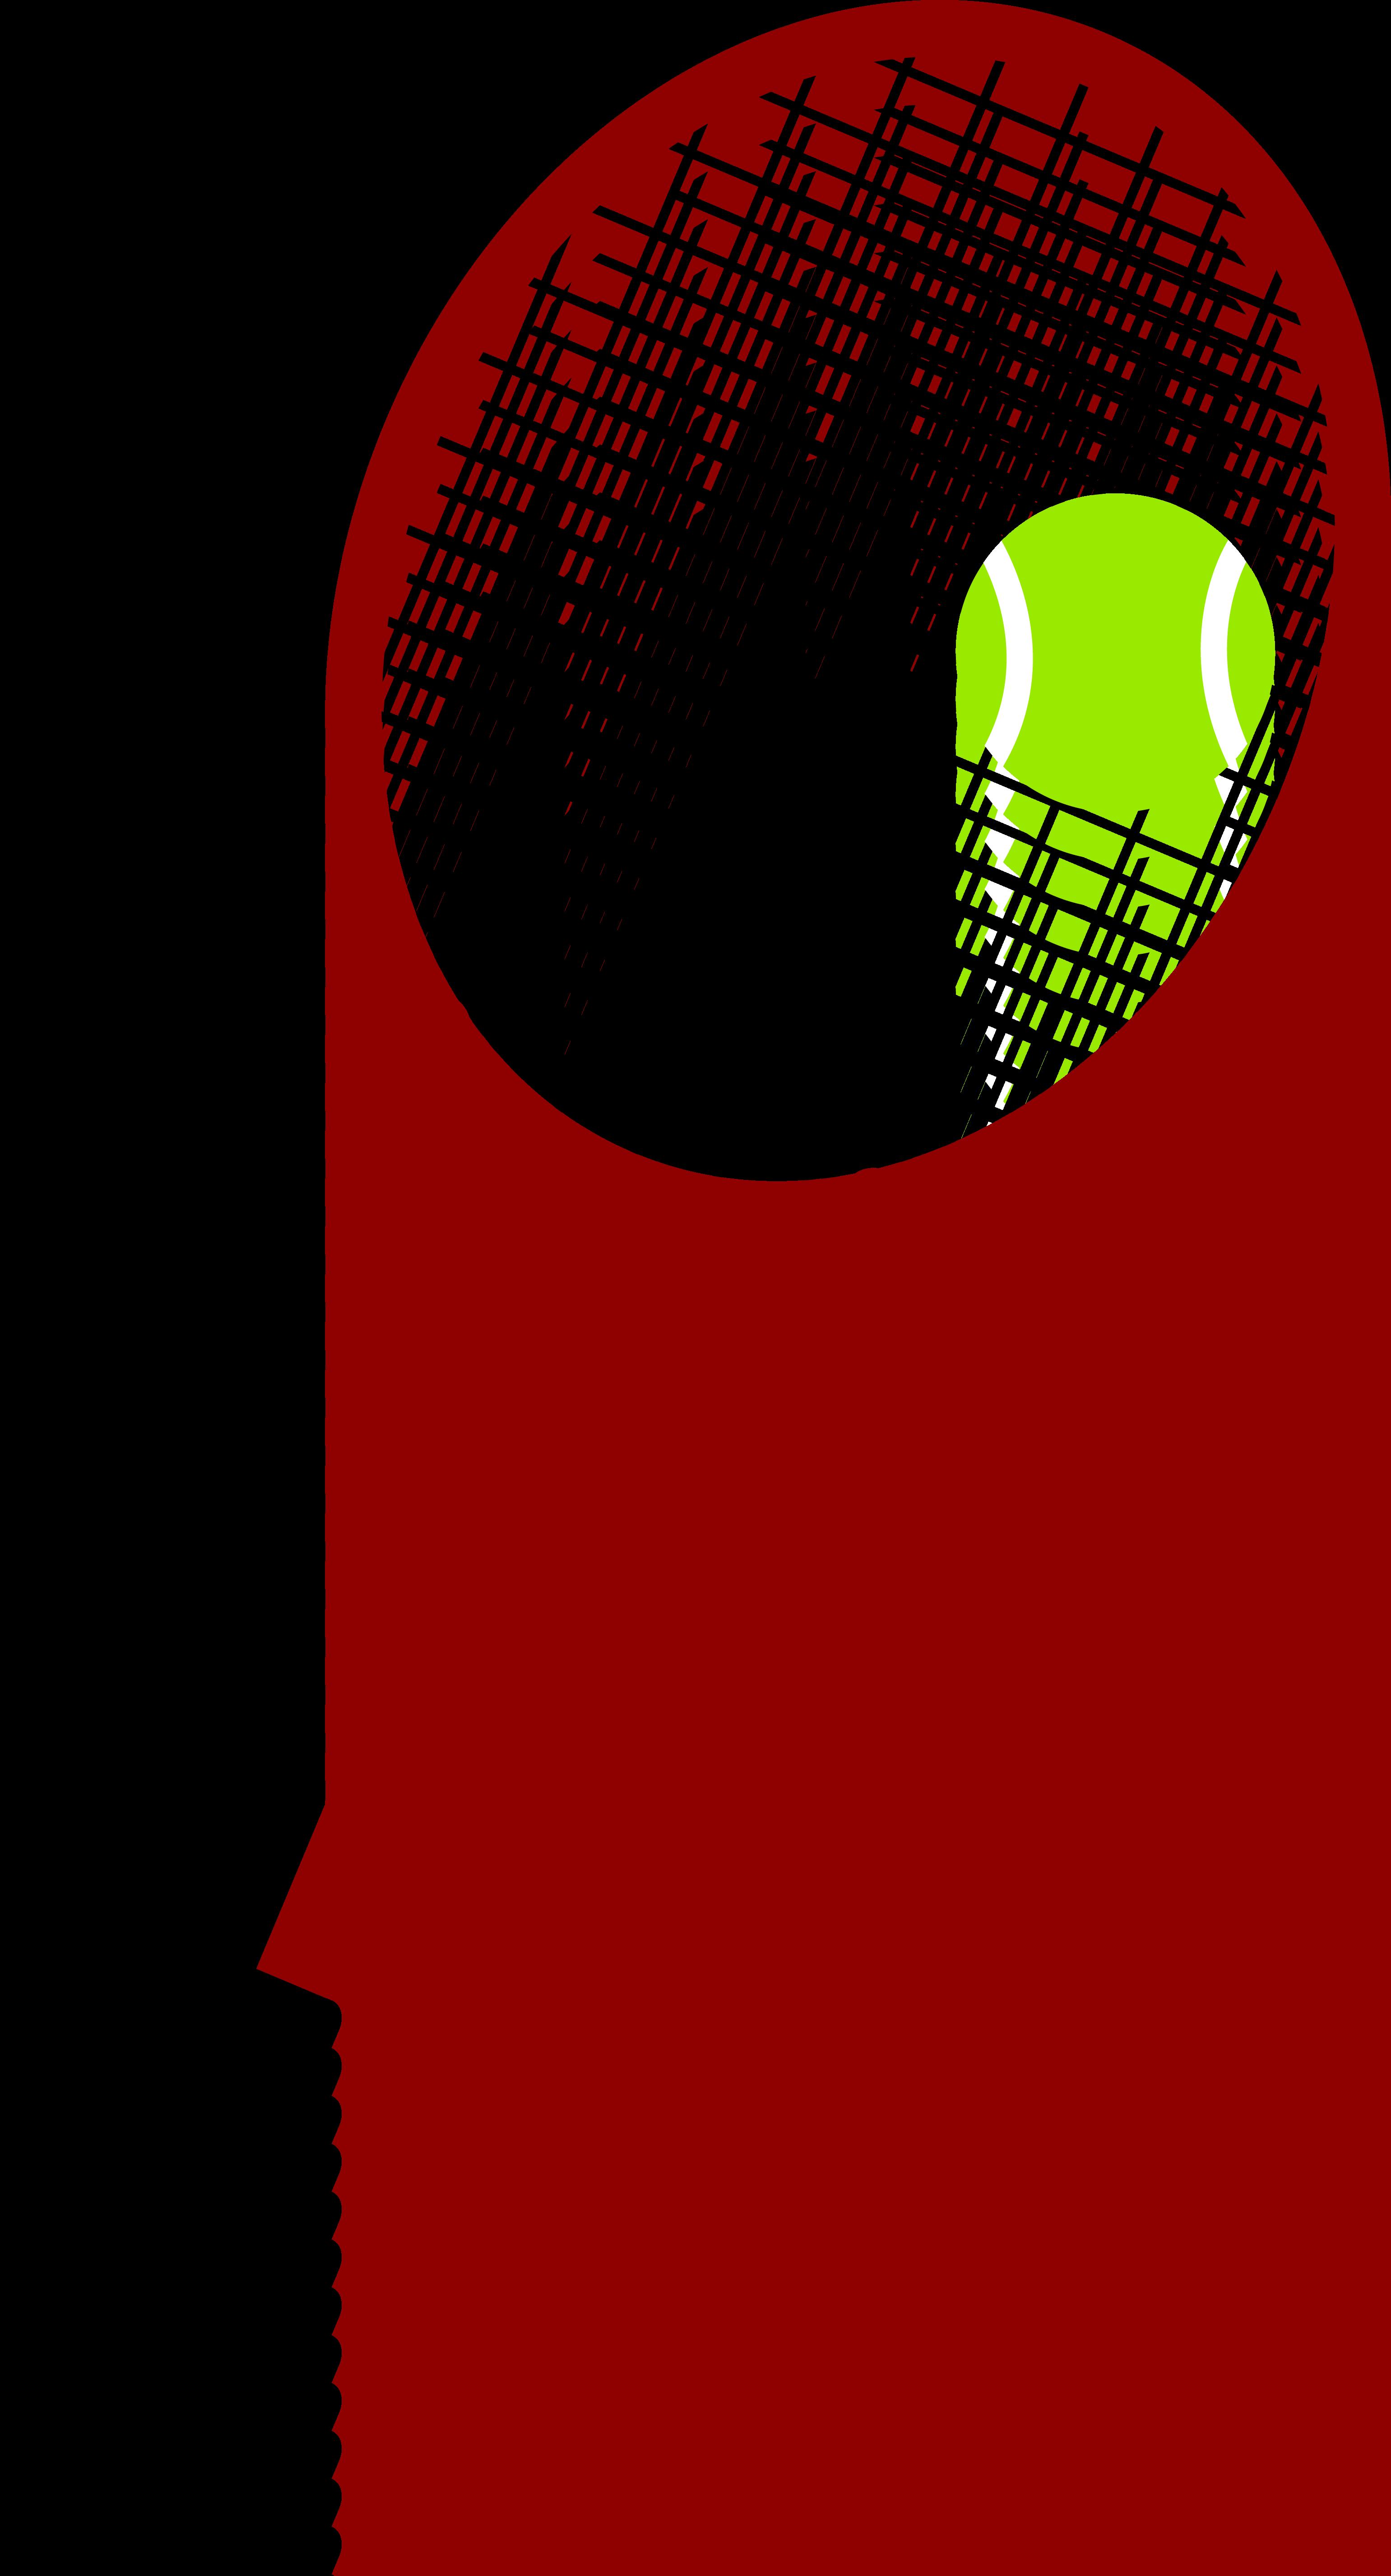 Free Tennis Cartoon Images, Download Free Clip Art, Free.